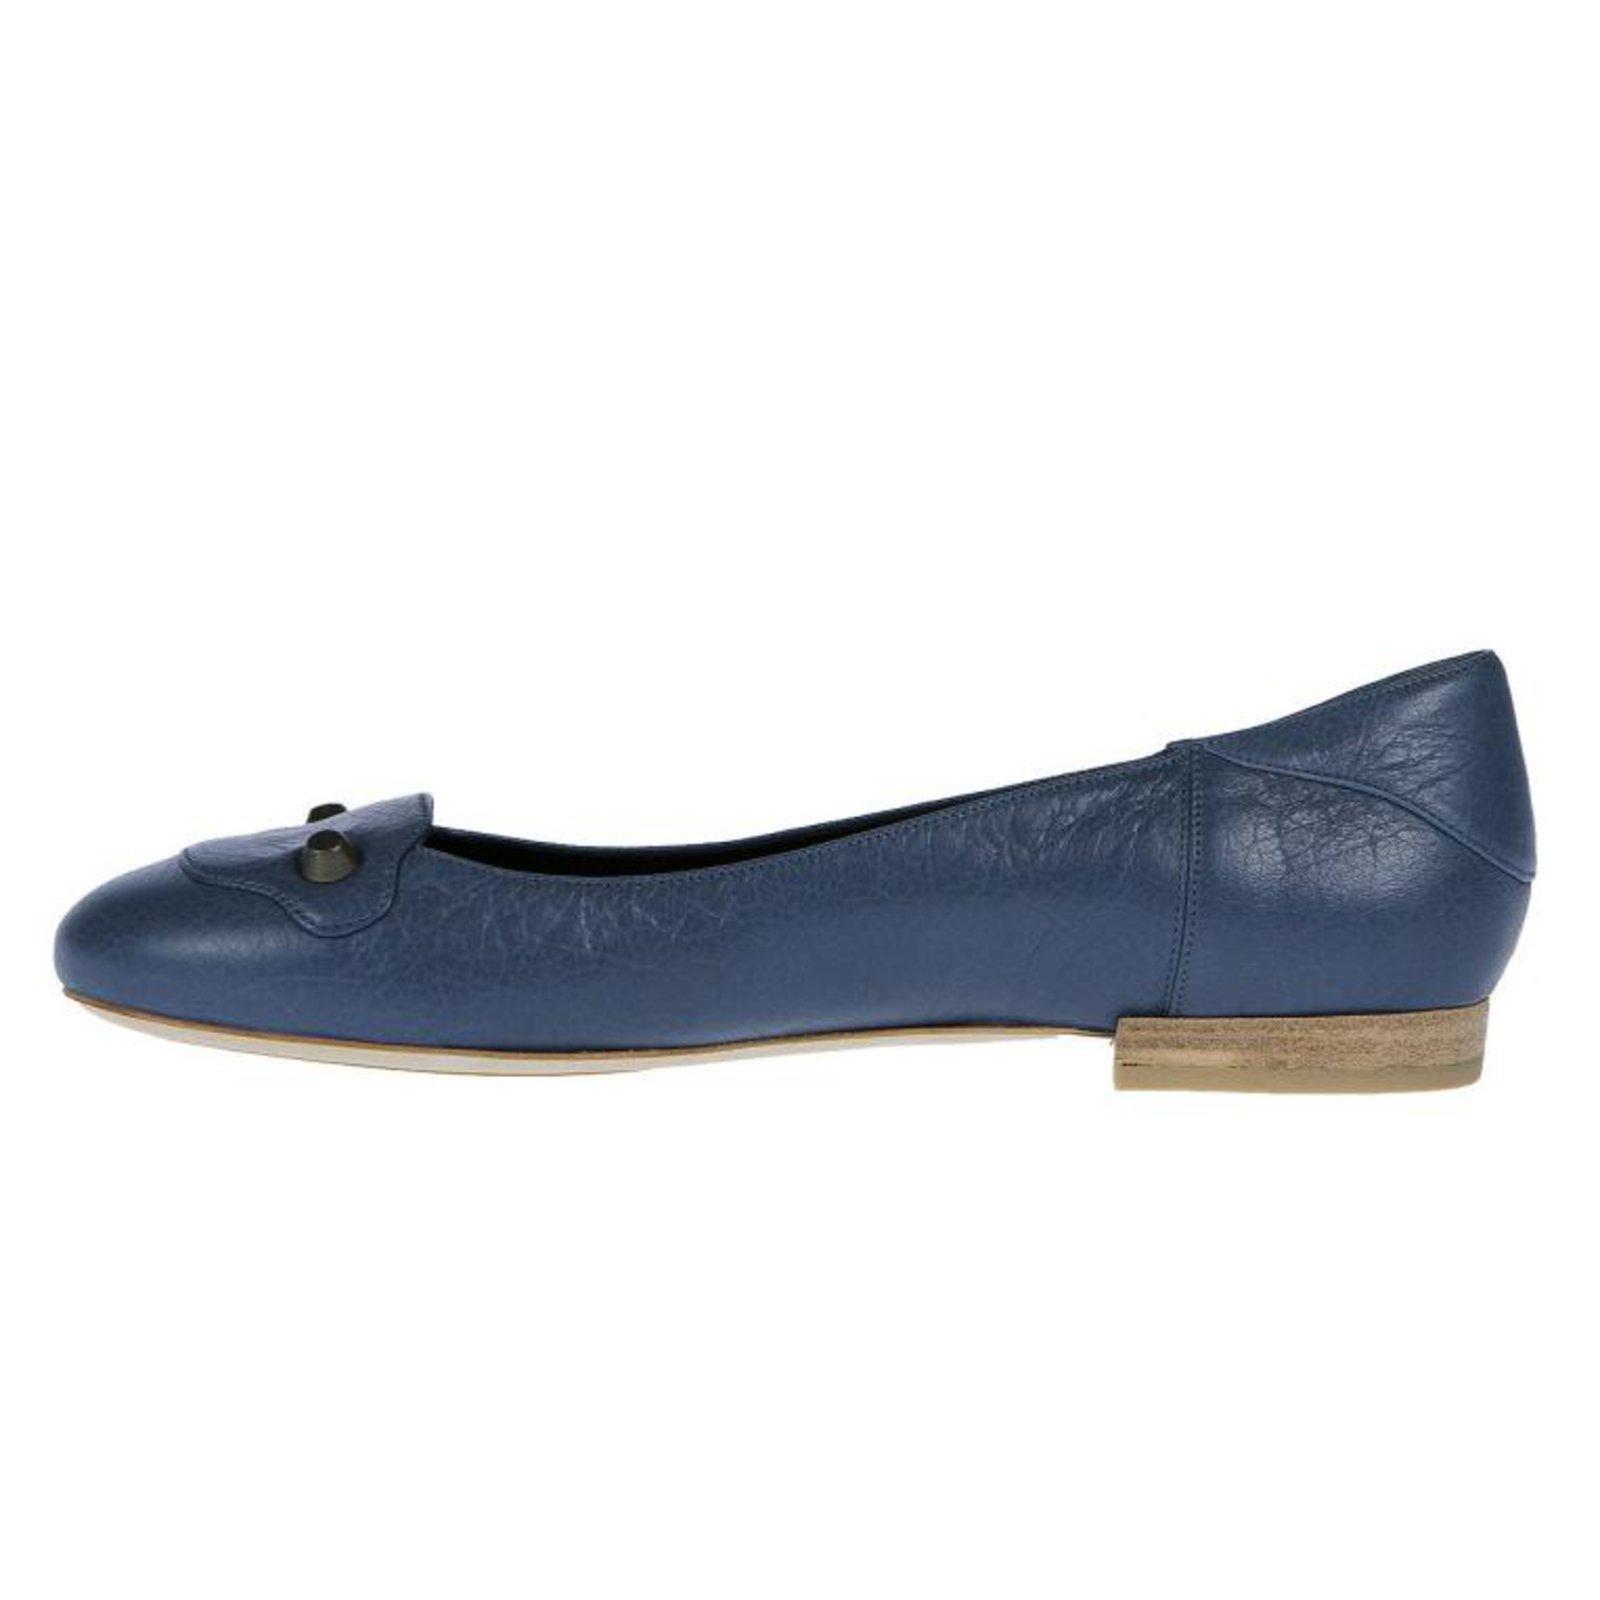 4e8f3f5c5656 Balenciaga ballerina flat shoes Flats Leather Blue ref.73524 - Joli ...